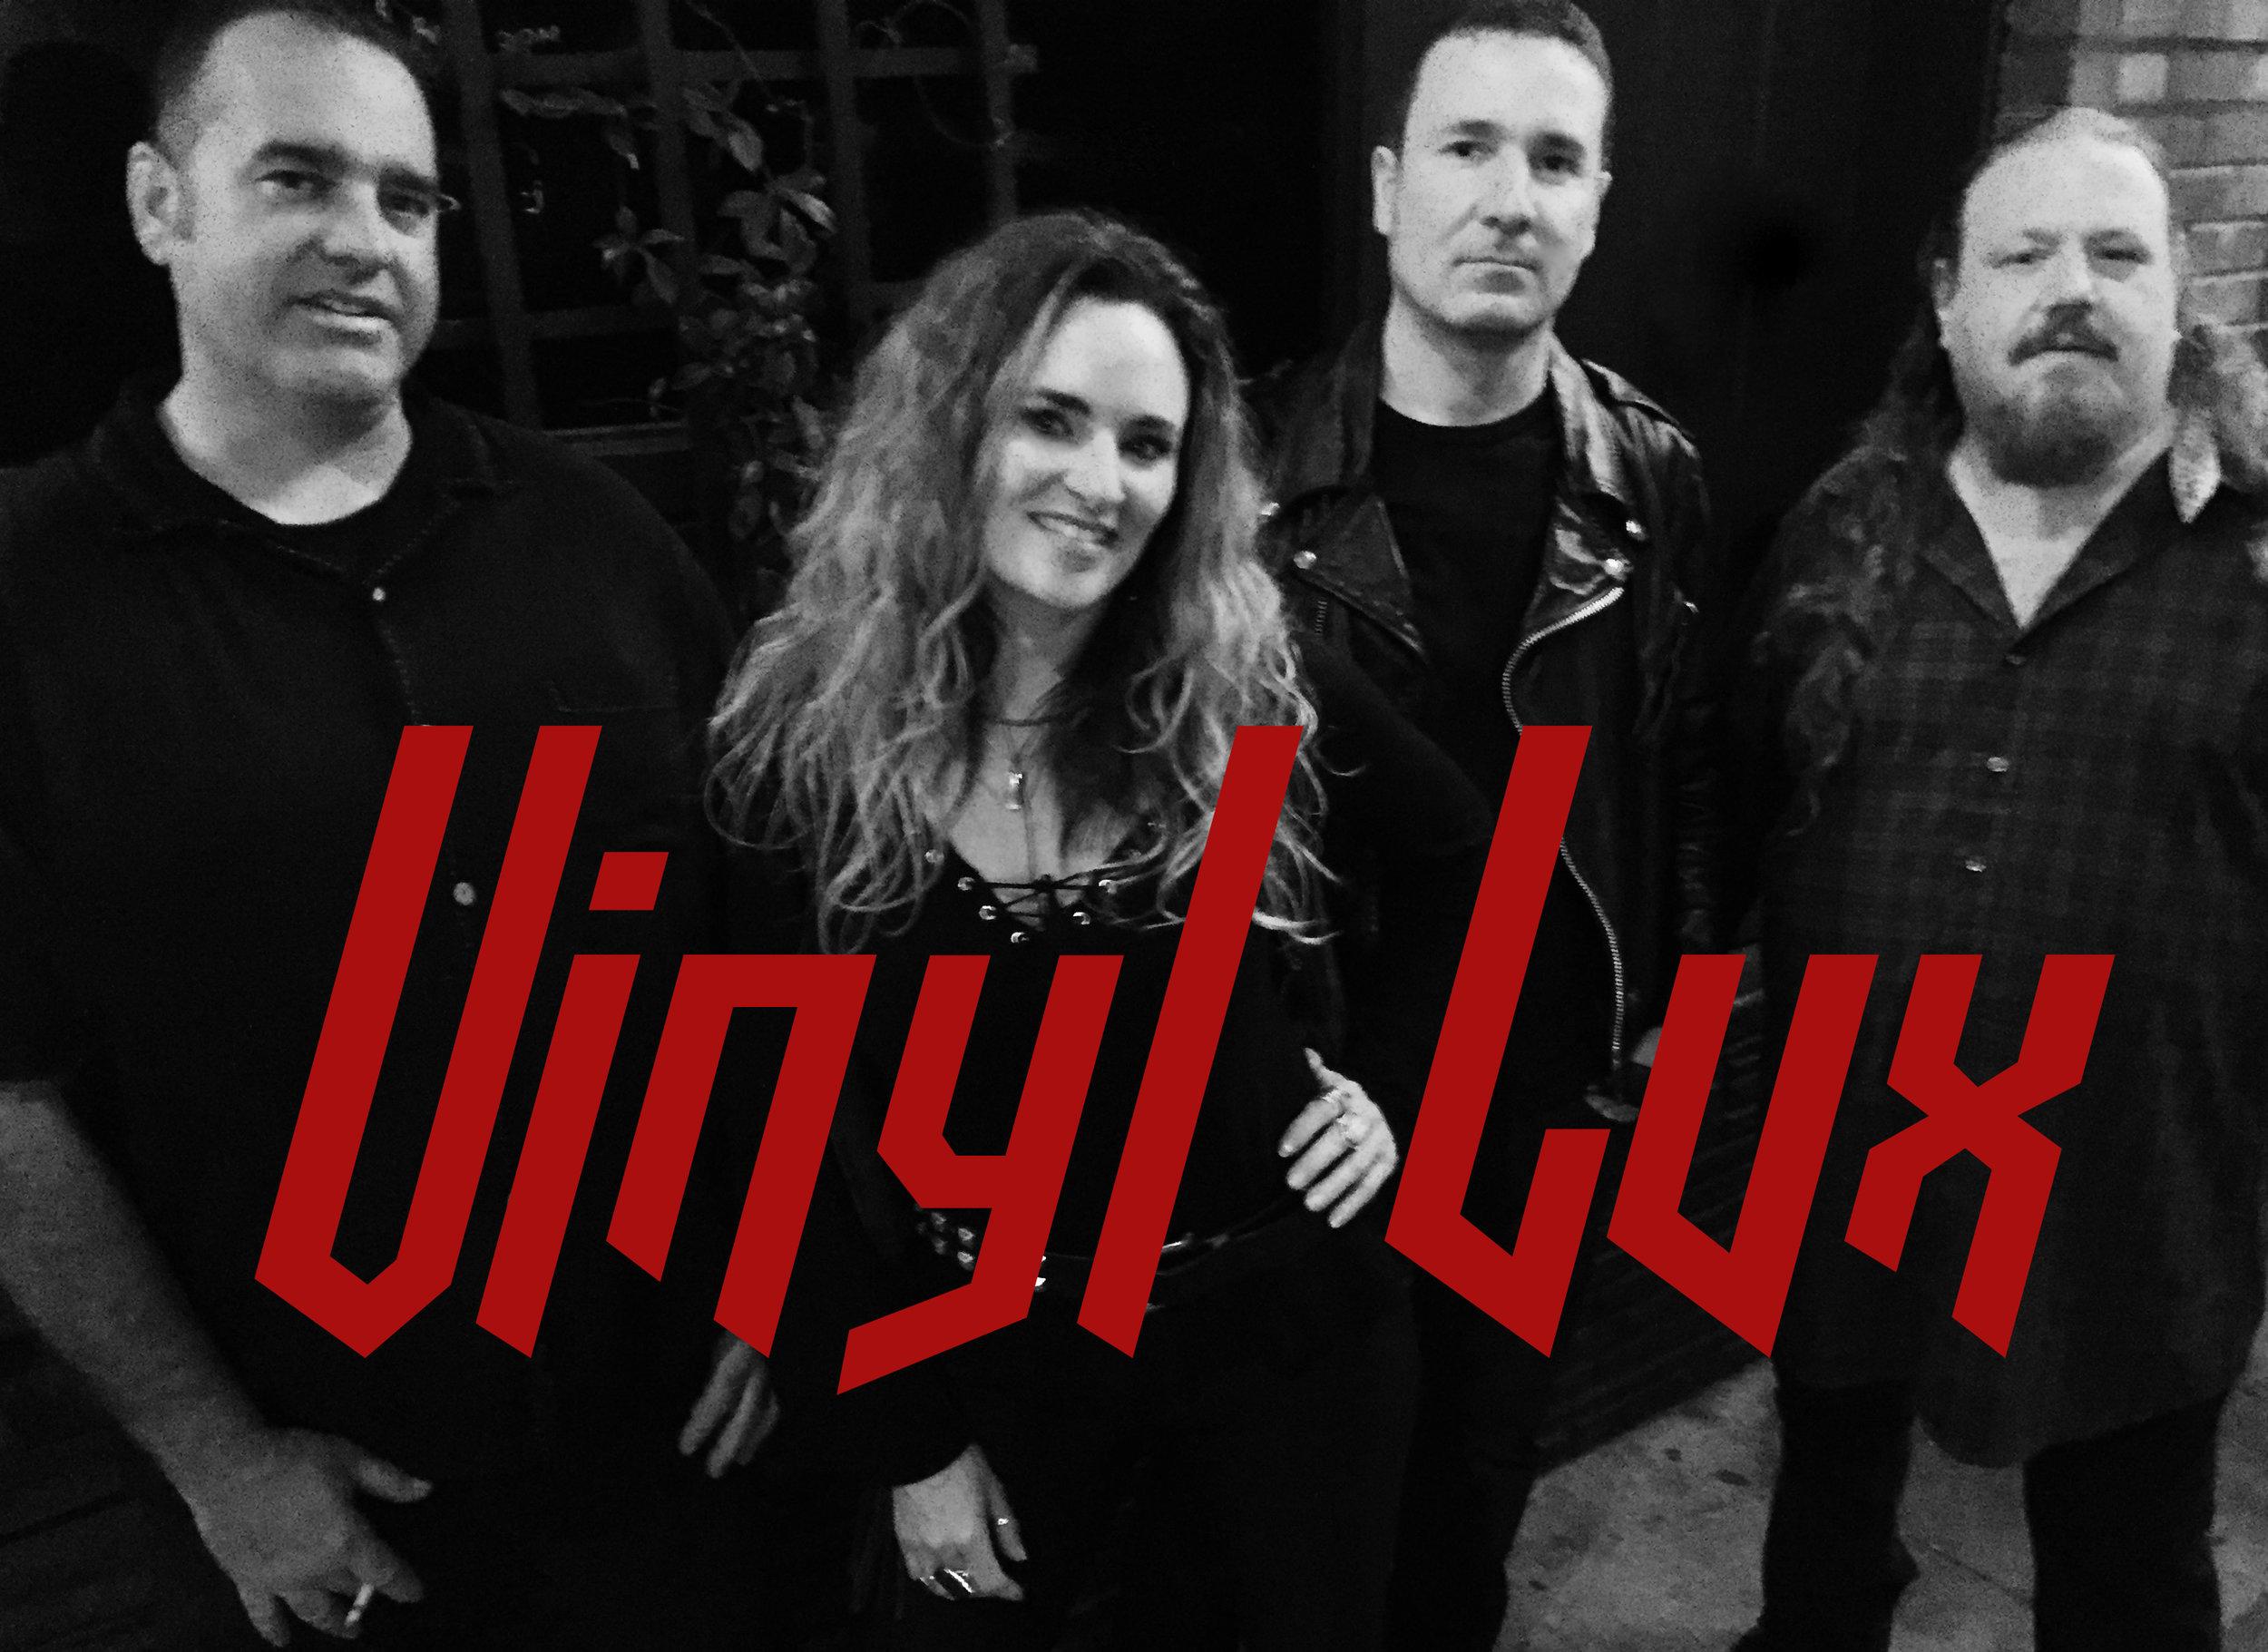 Vinyl Lux 70s-90s classic rock covers